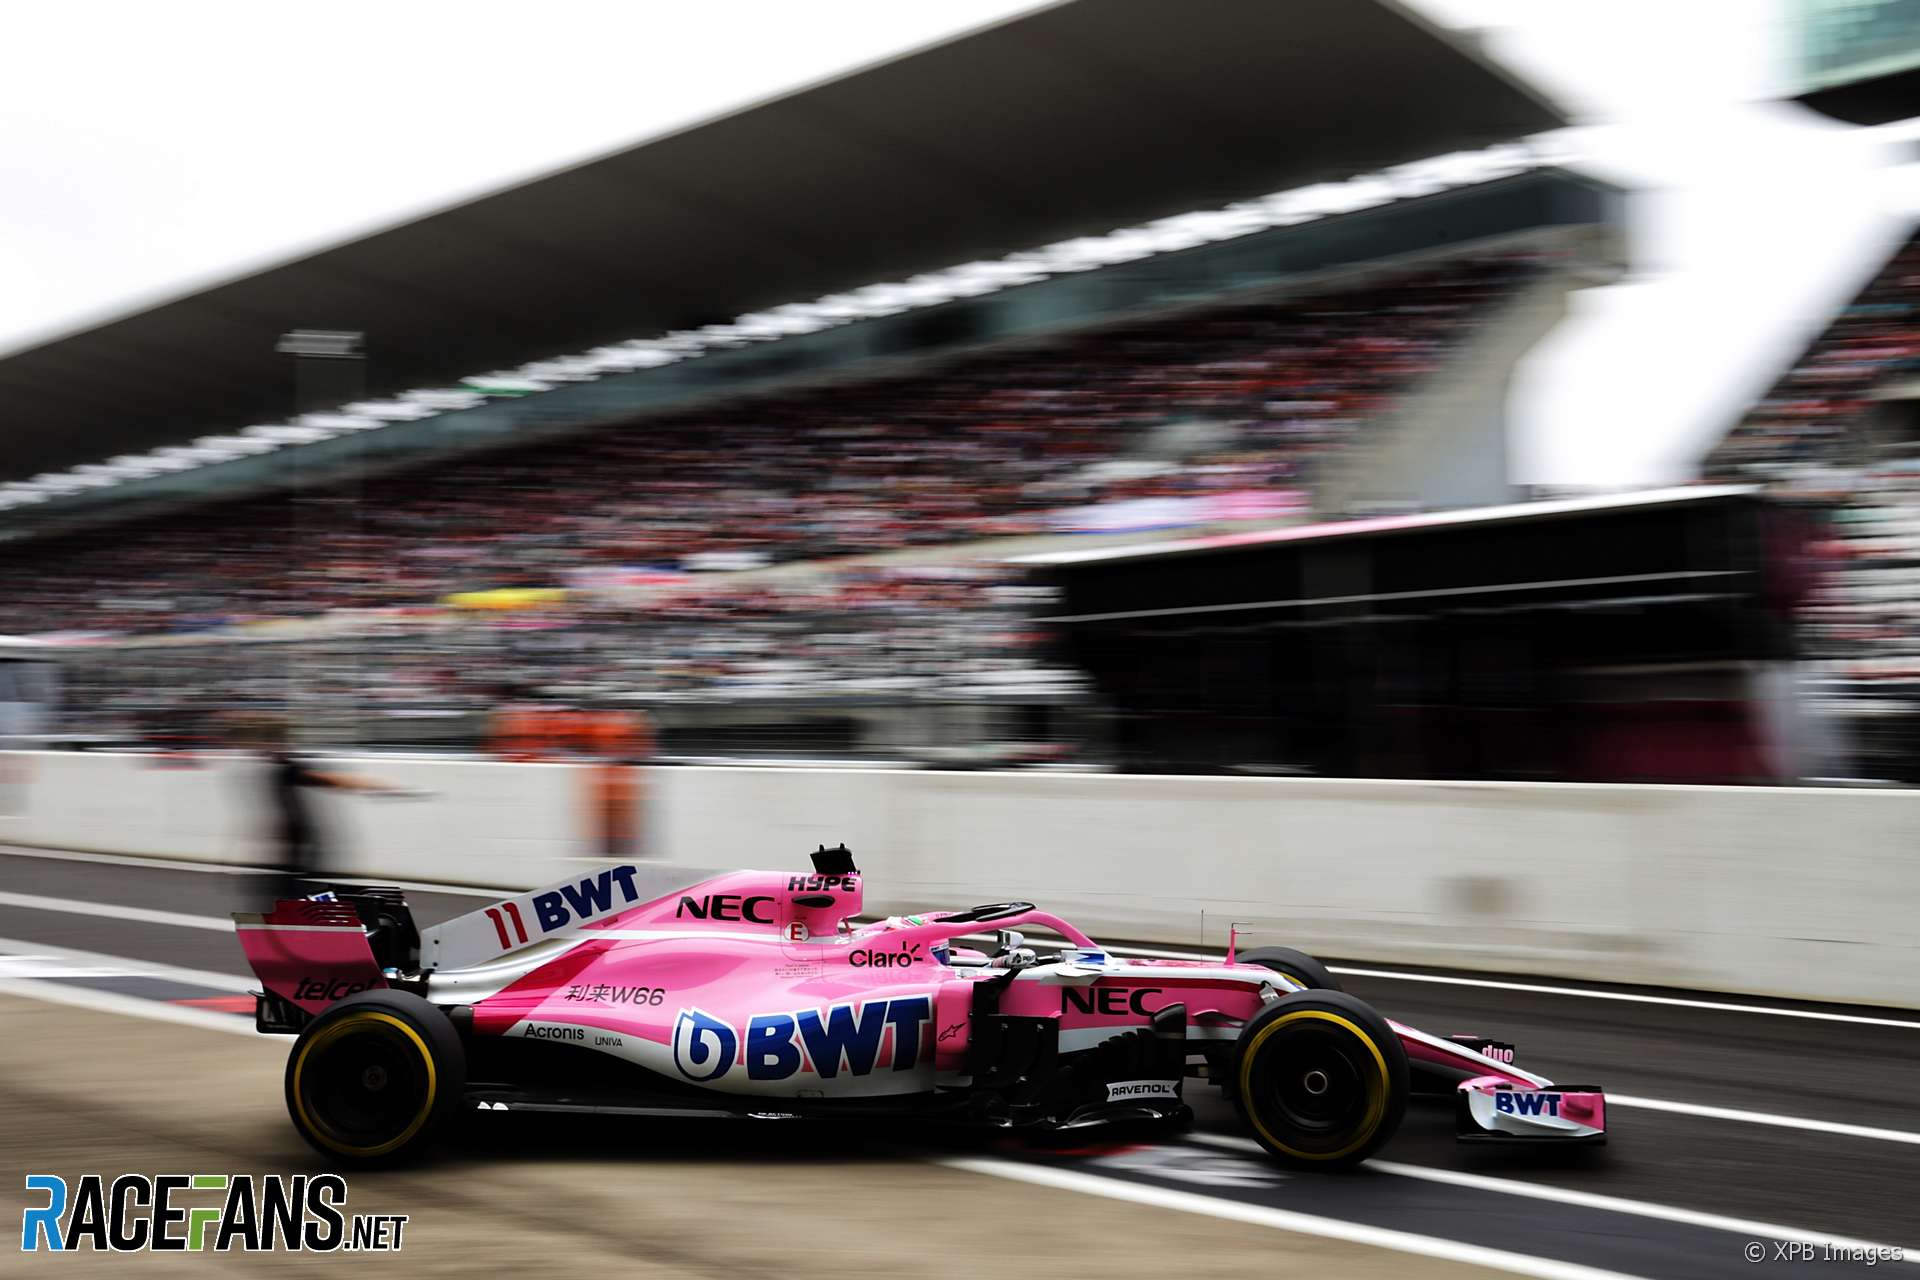 Sergio Perez, Force India, Suzuka, 2018